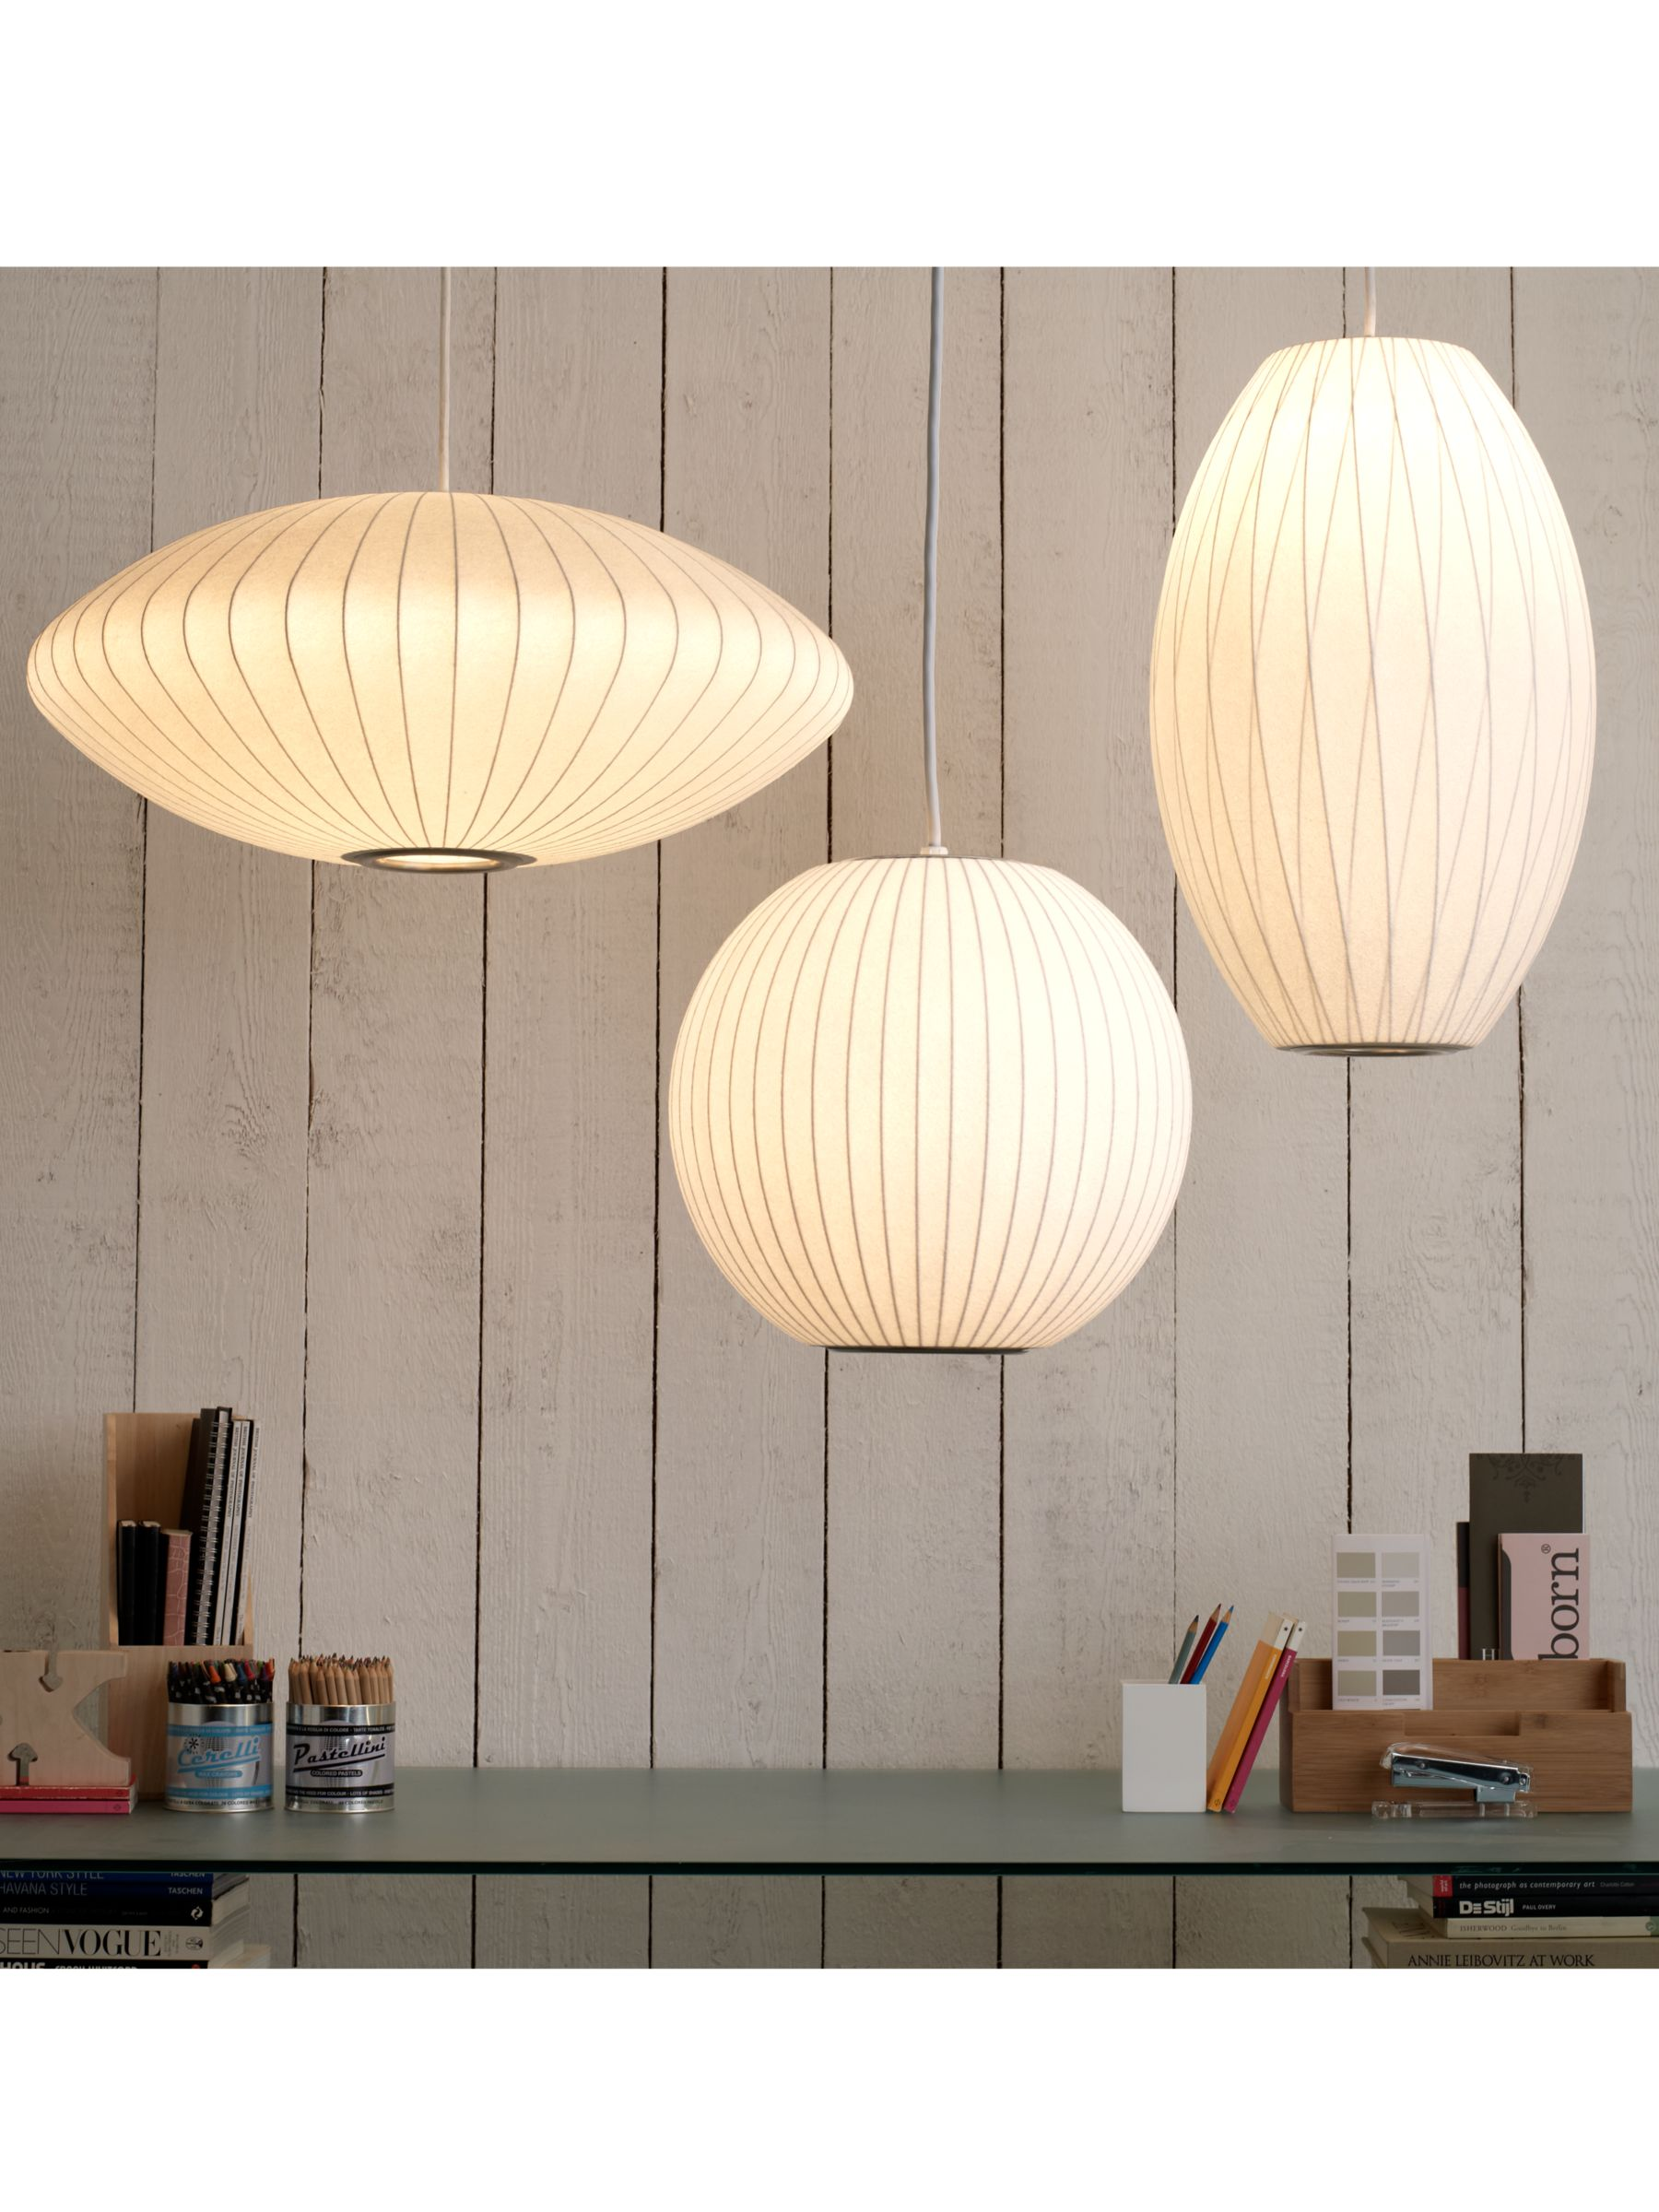 Herman Miller Bubble Saucer Ceiling Light Medium At John Lewis Partners